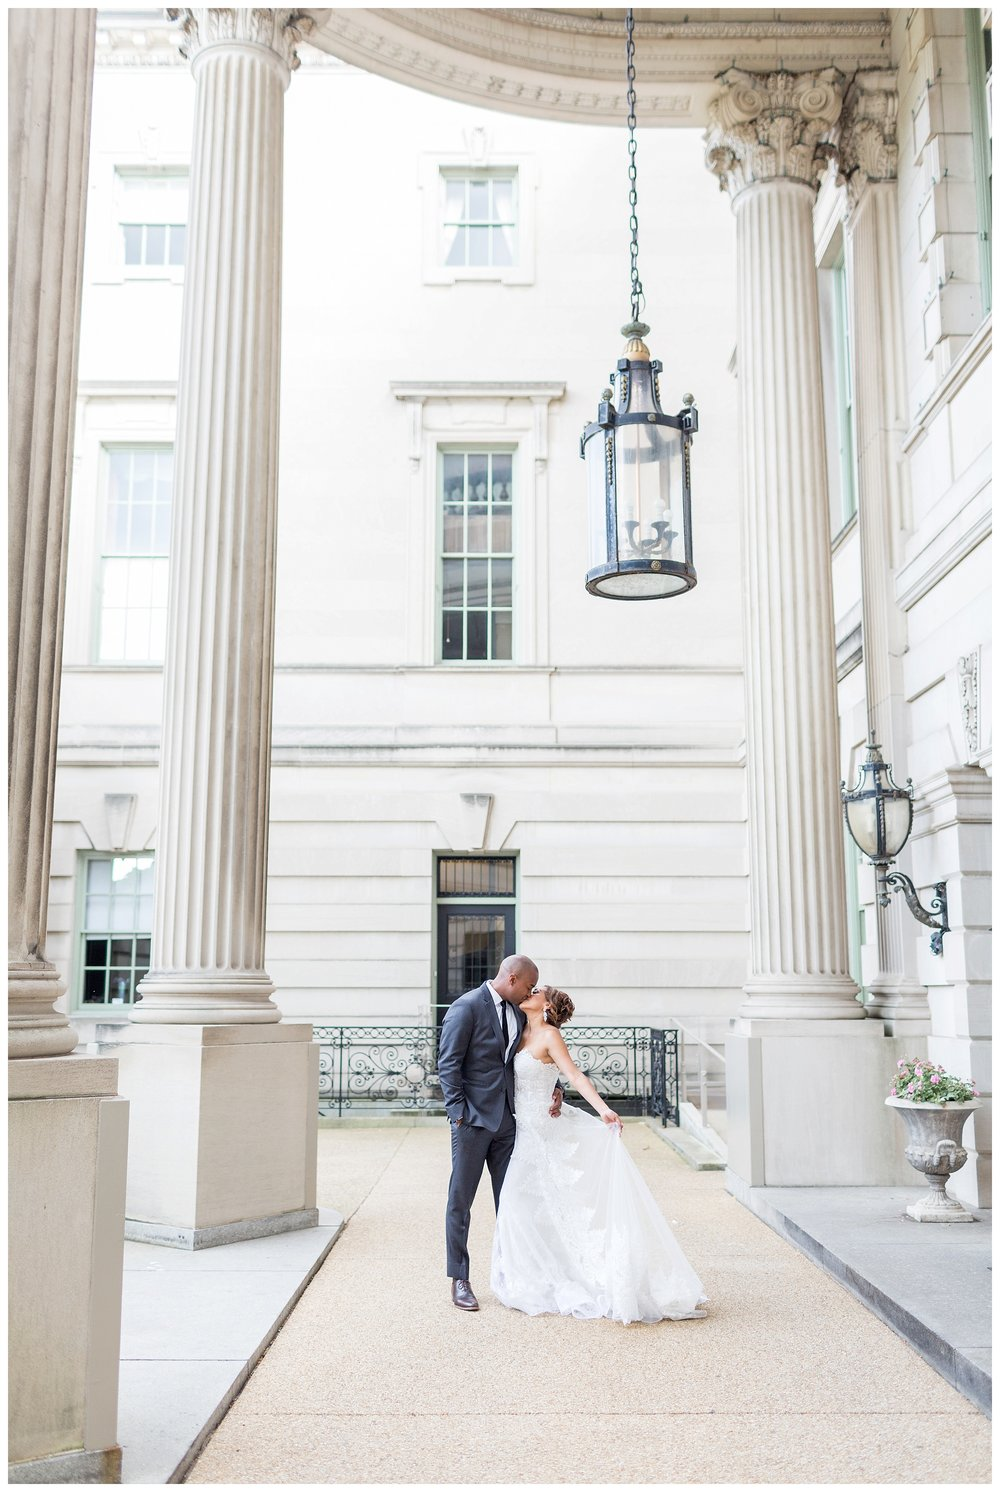 Anderson House Wedding DC Wedding Photographer Kir Tuben_0043.jpg